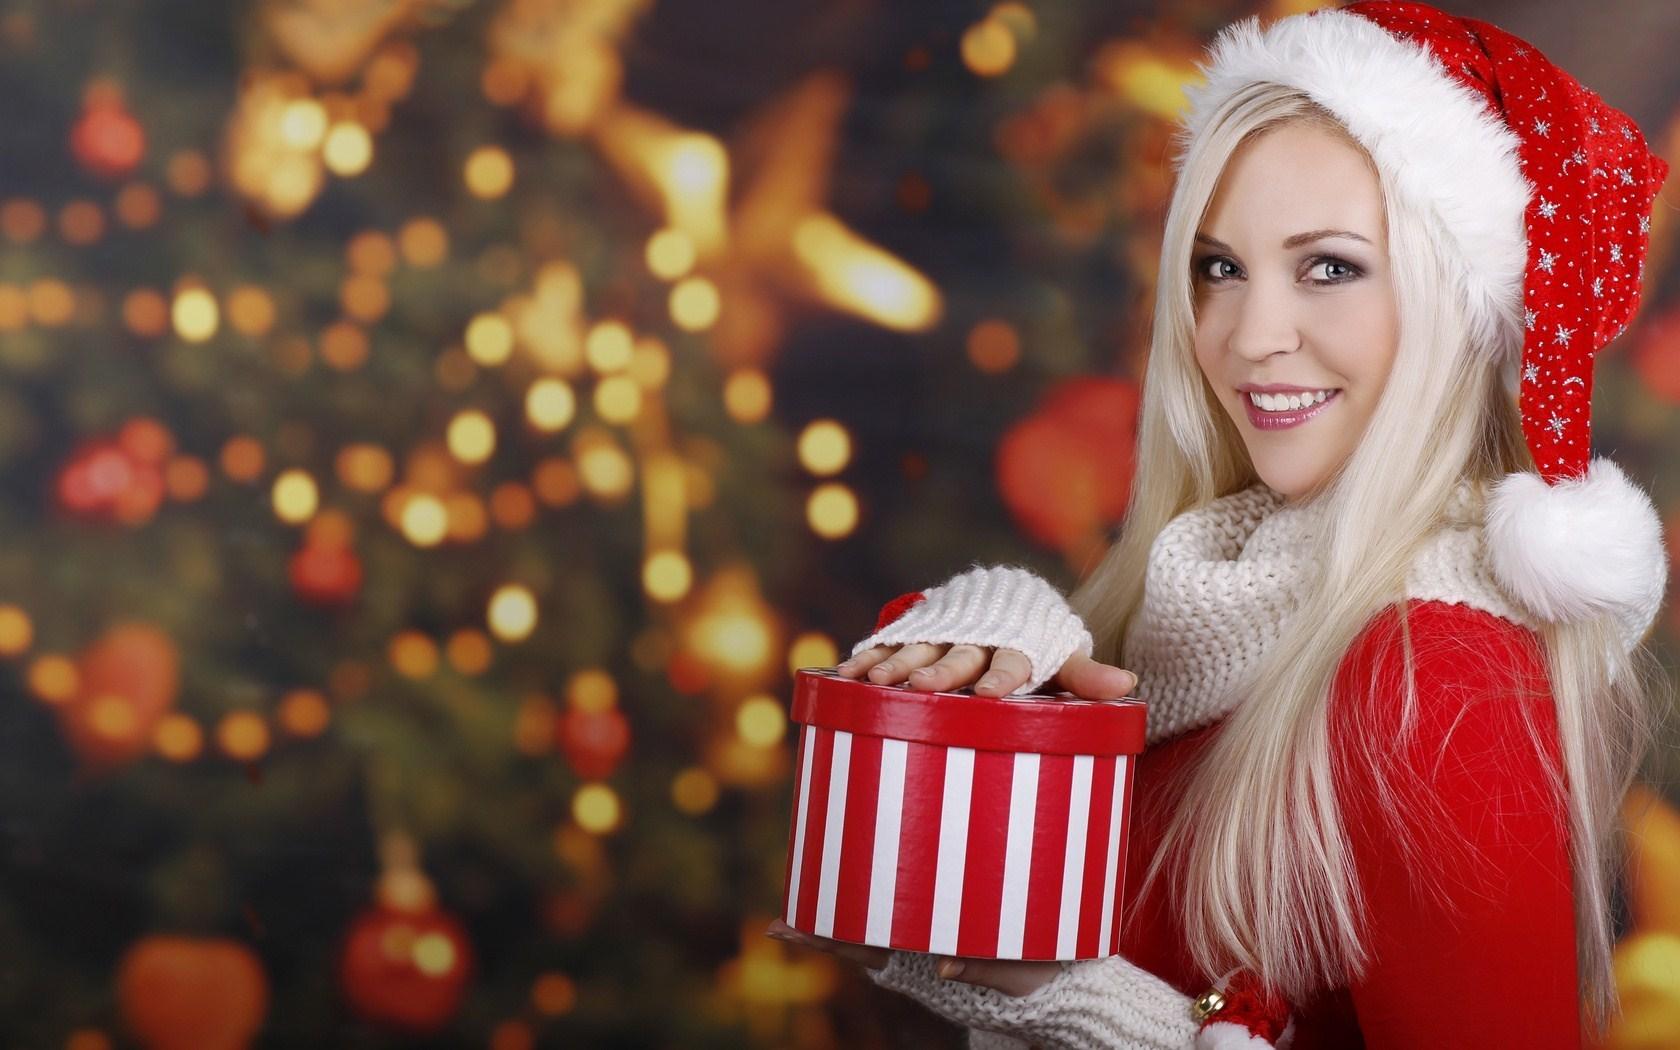 Christmas Tree Santa Claus Blonde Girl Smile Gift Winter